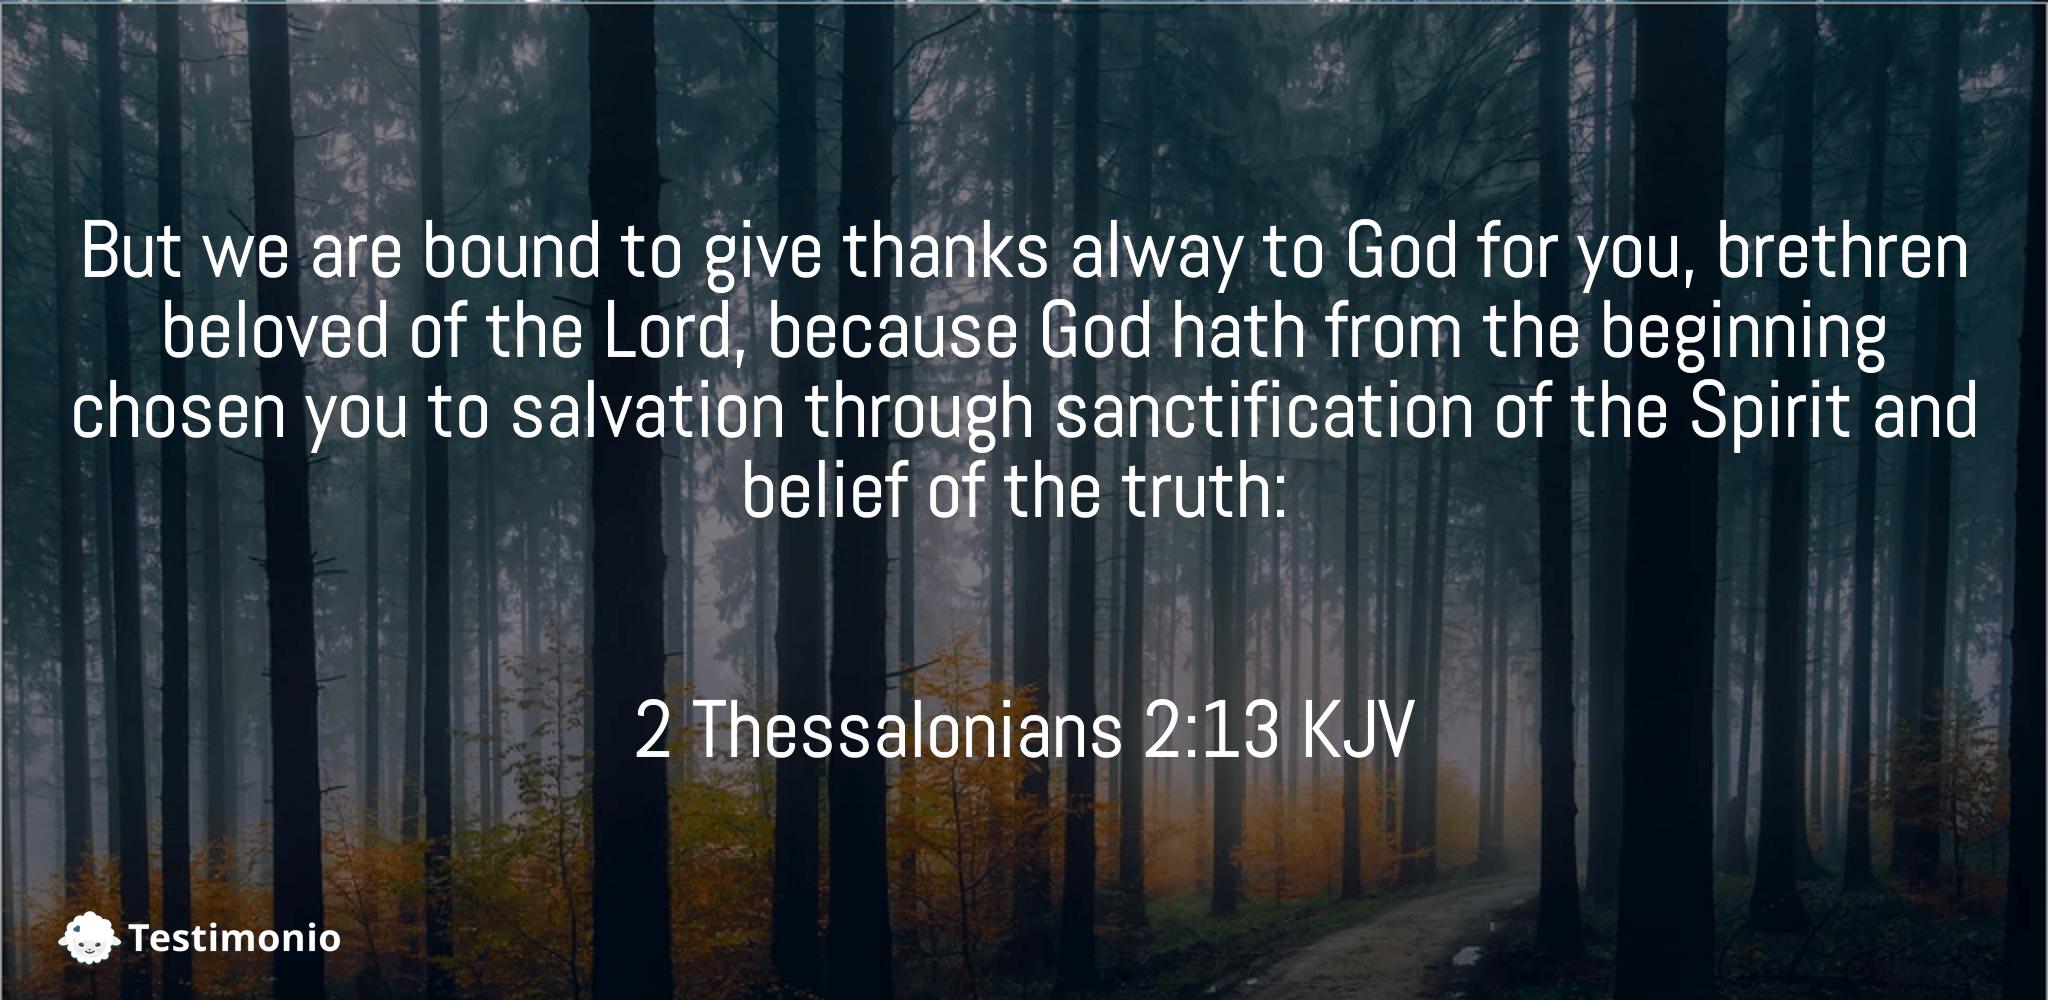 2 Thessalonians 2:13